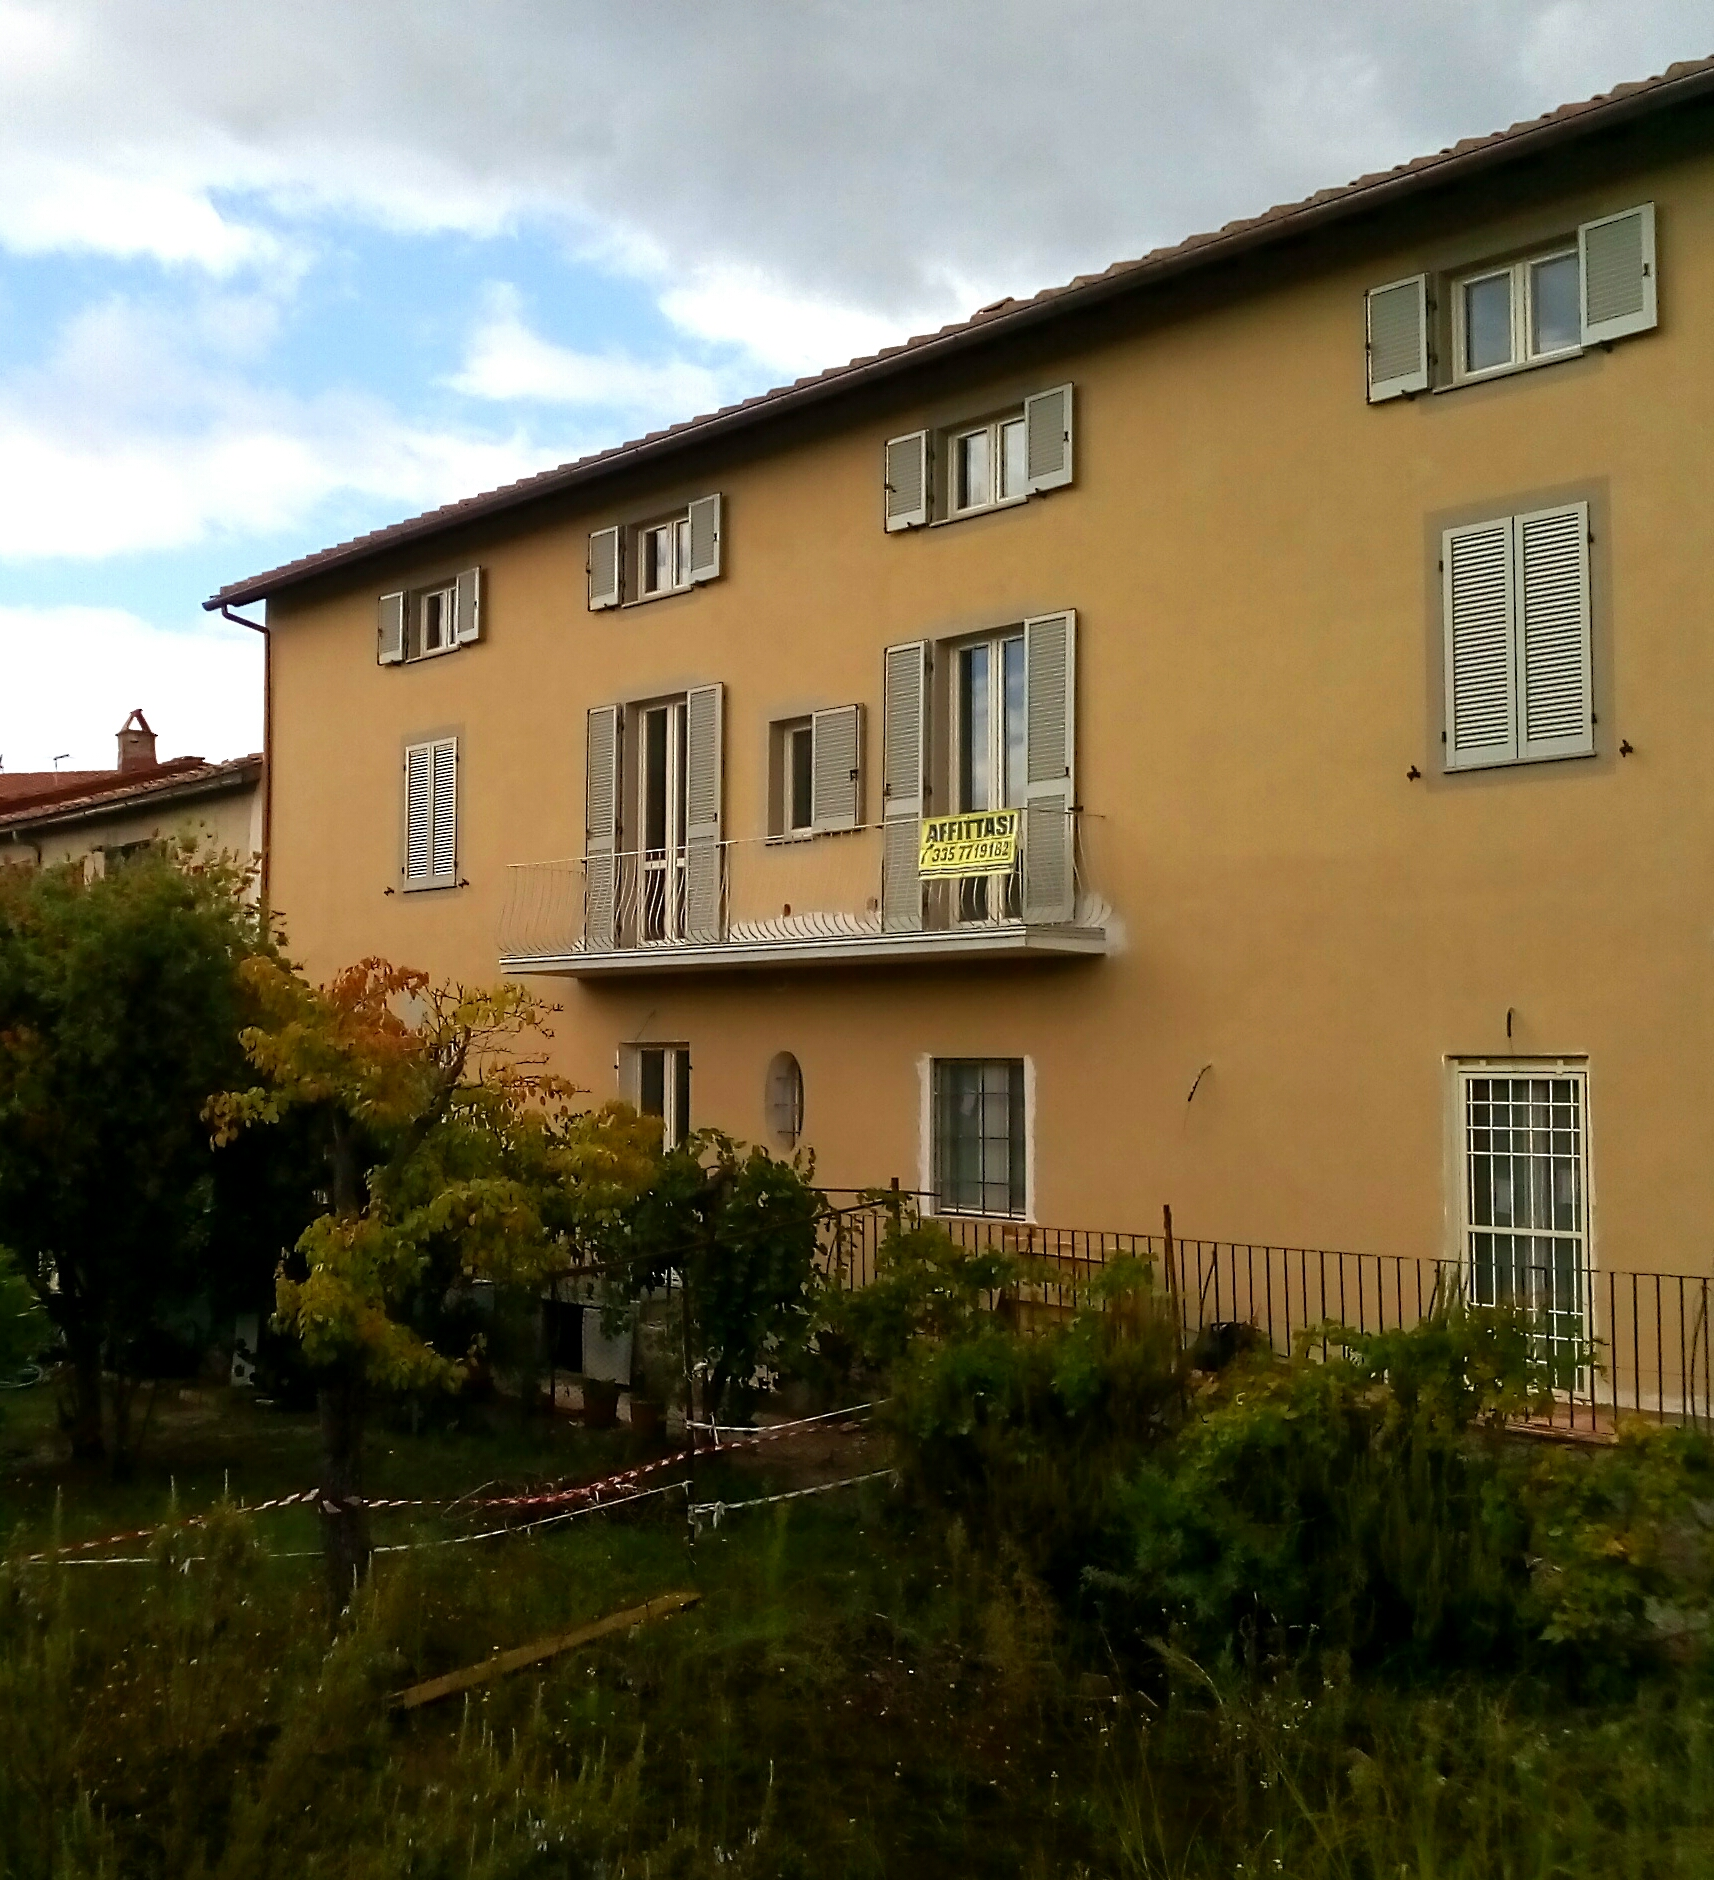 Porzione di casa in affitto a Lungarni, Pisa